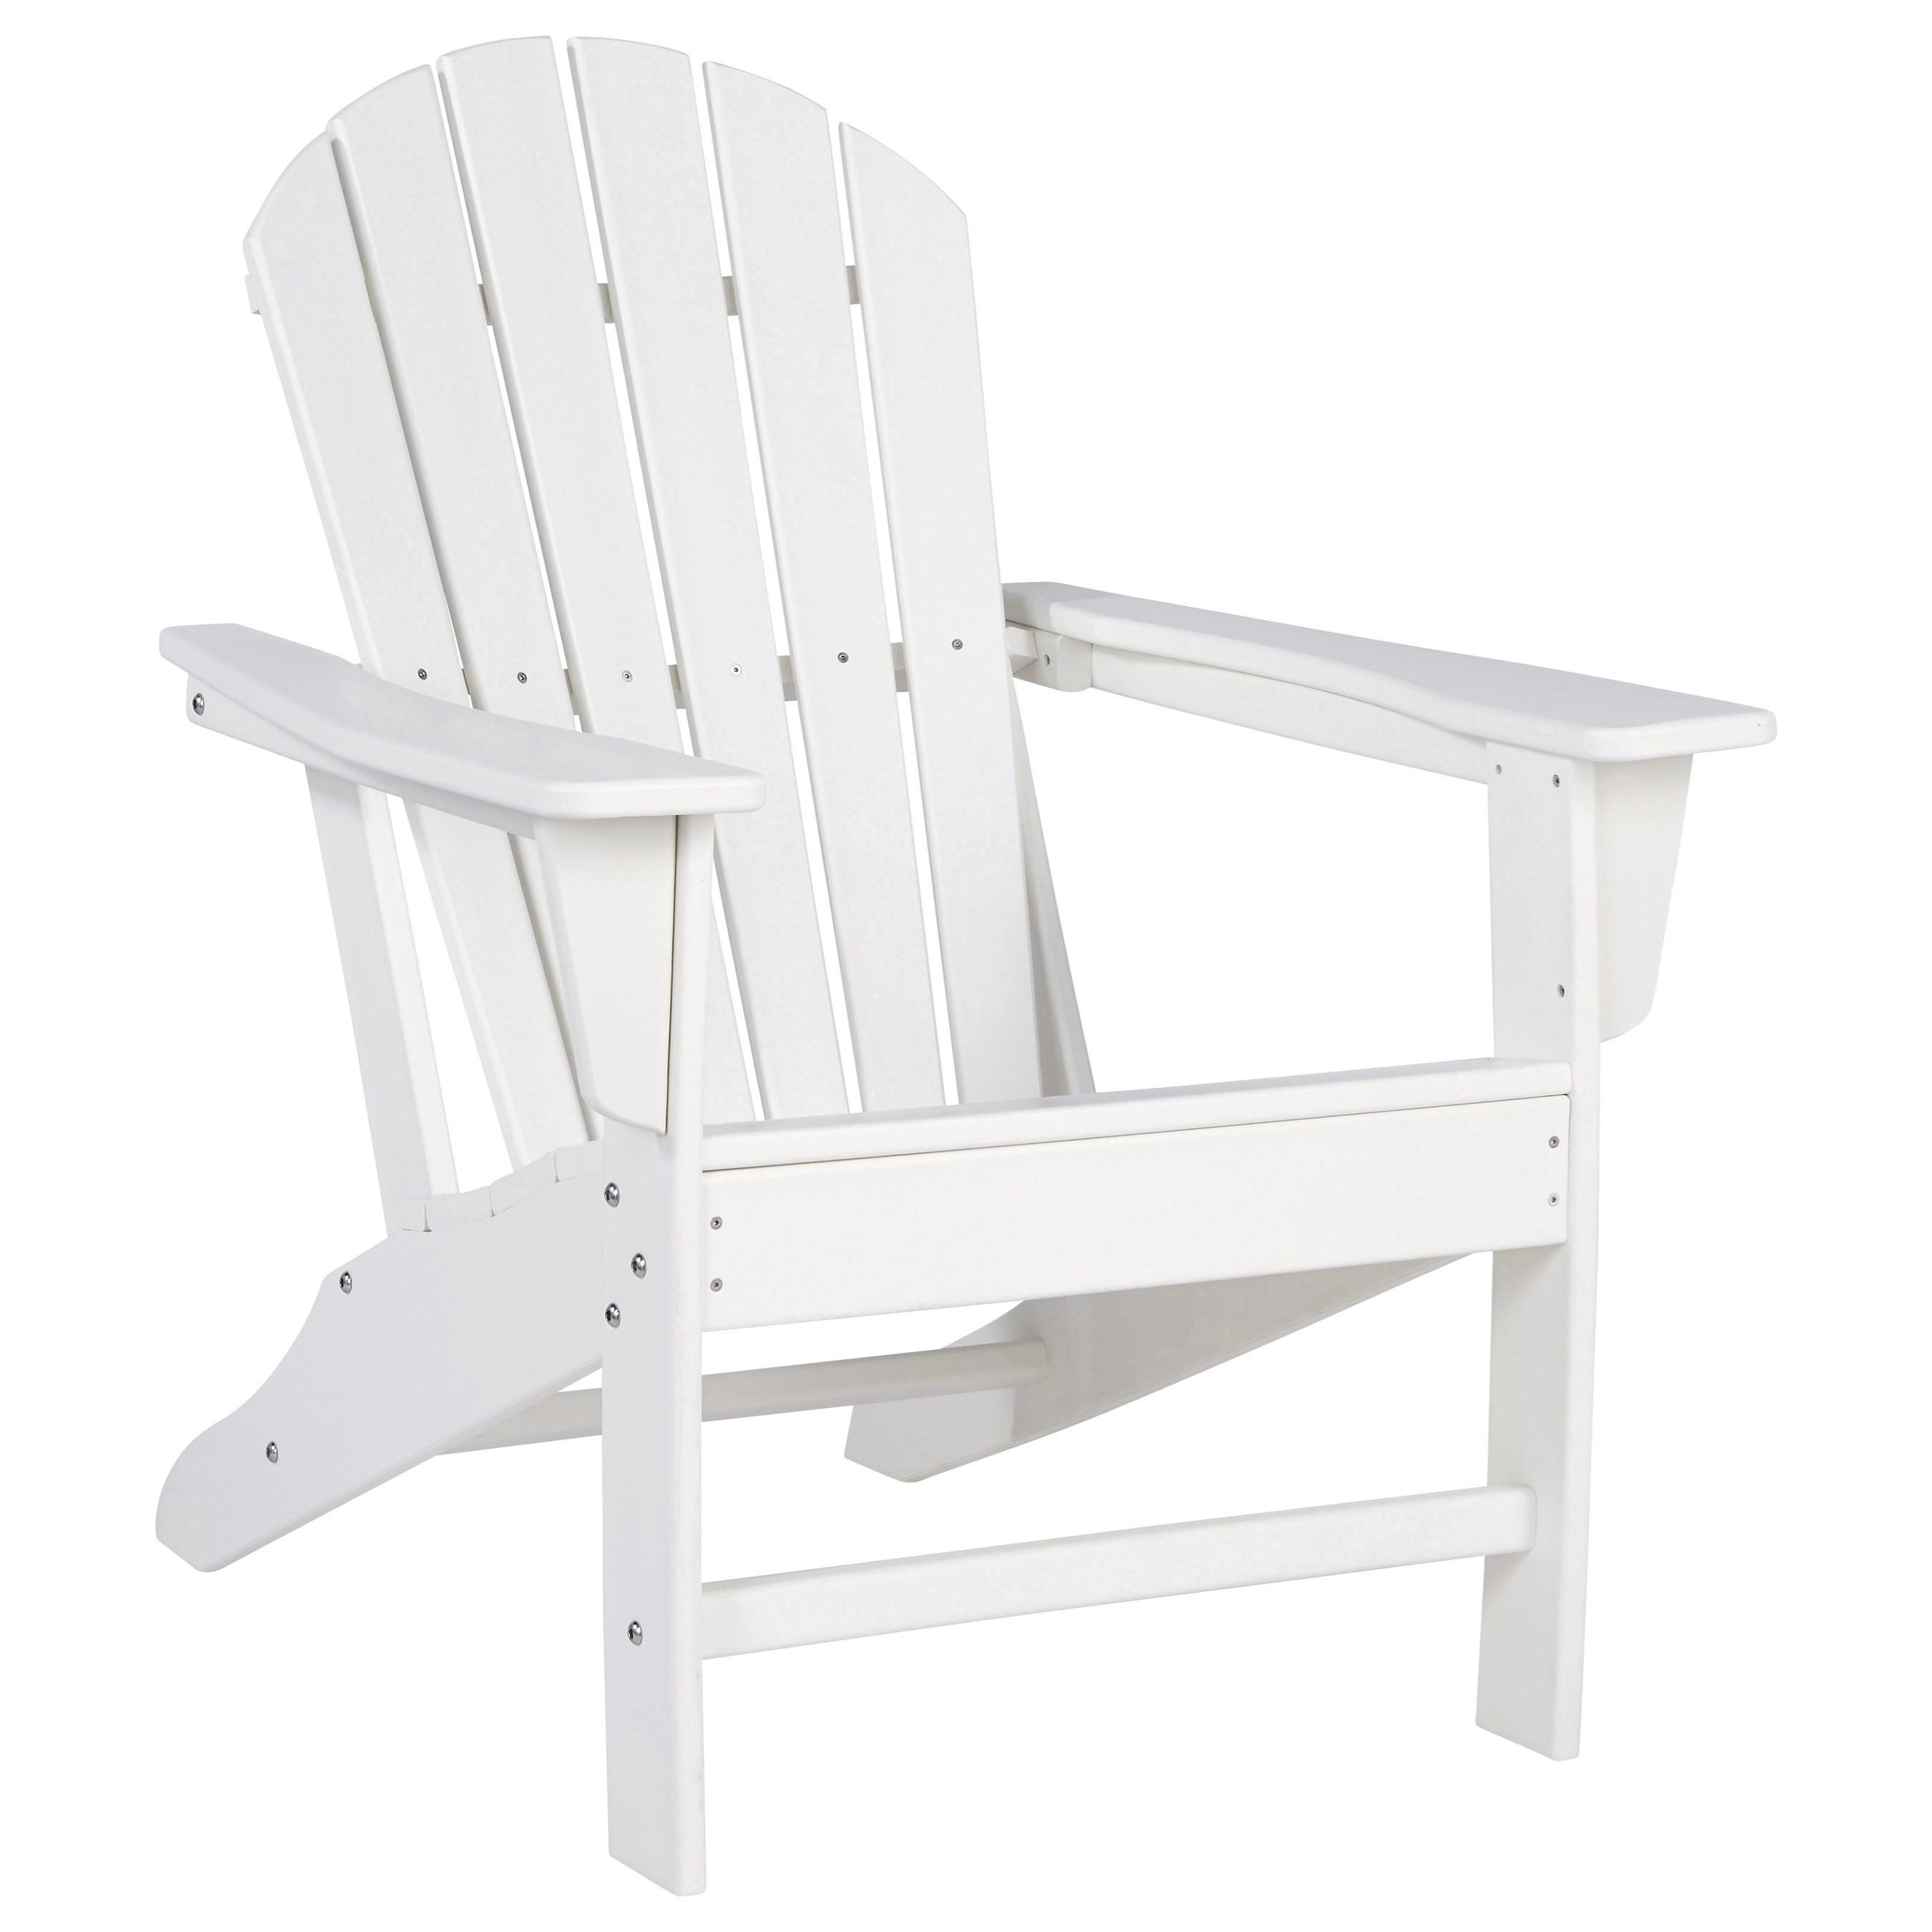 Adirondack White Adirondack Chair by Signature Design by Ashley at Rotmans